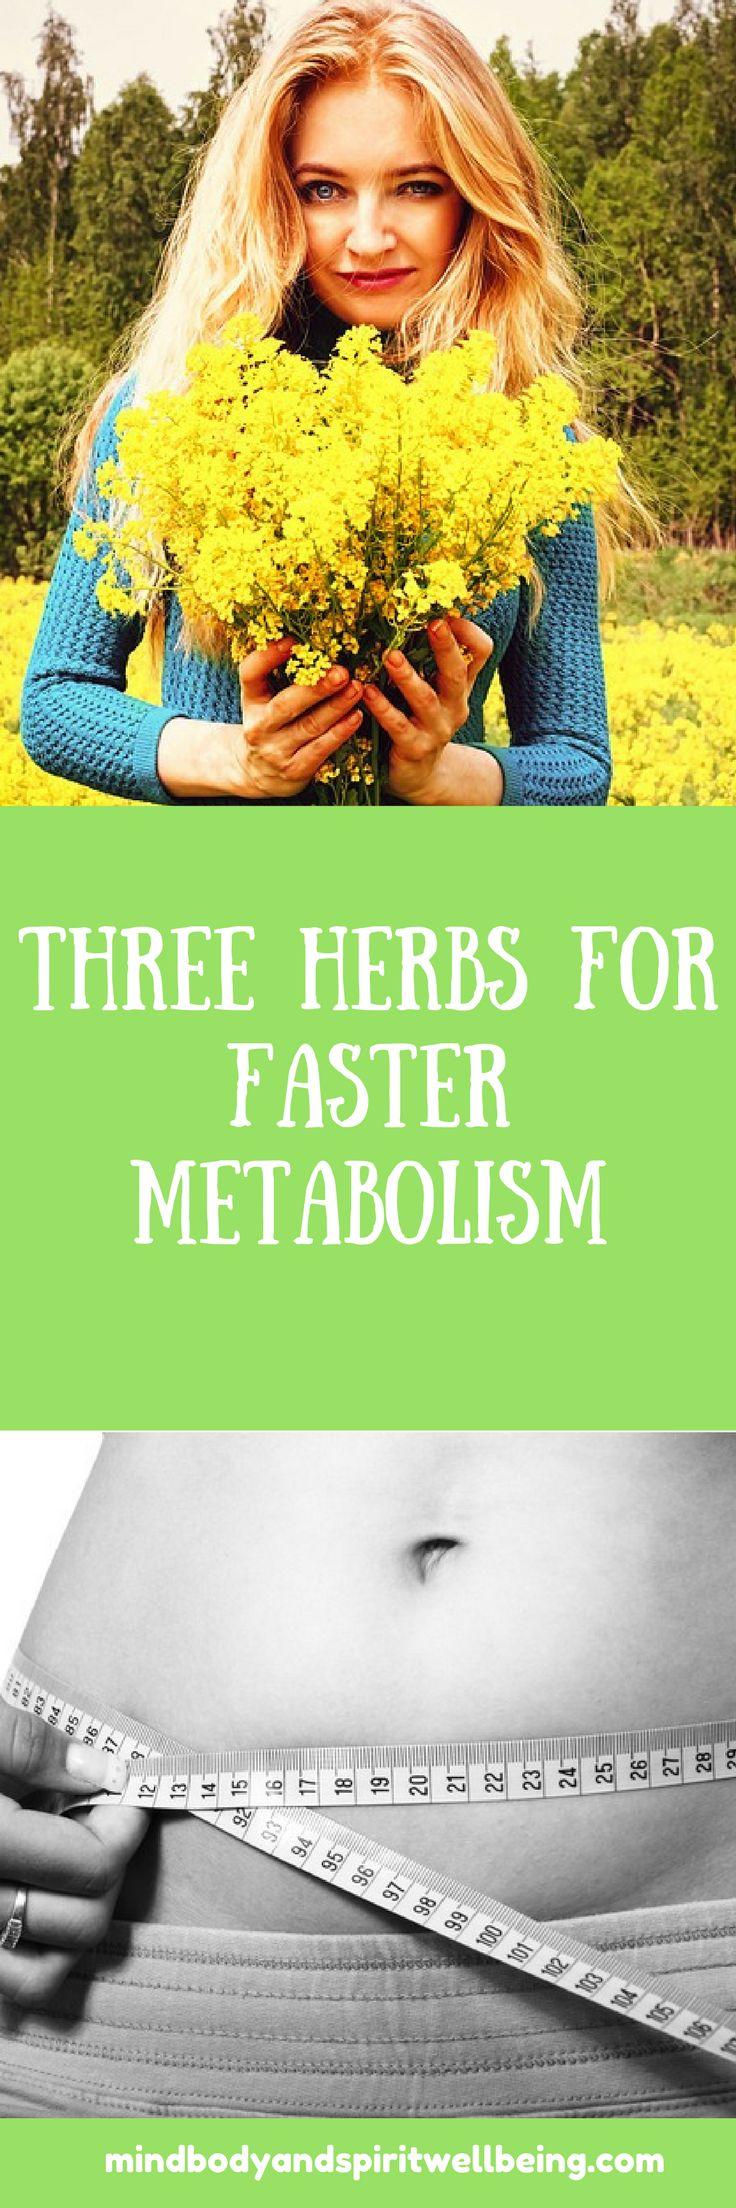 fast metabolism, metabolism booster, herbs for metabolism, detox, cleanse, liver detox, dandelion, st. john's wort, stinging nettle, herbal tea, detoxing tea, weight loss, slimming tea